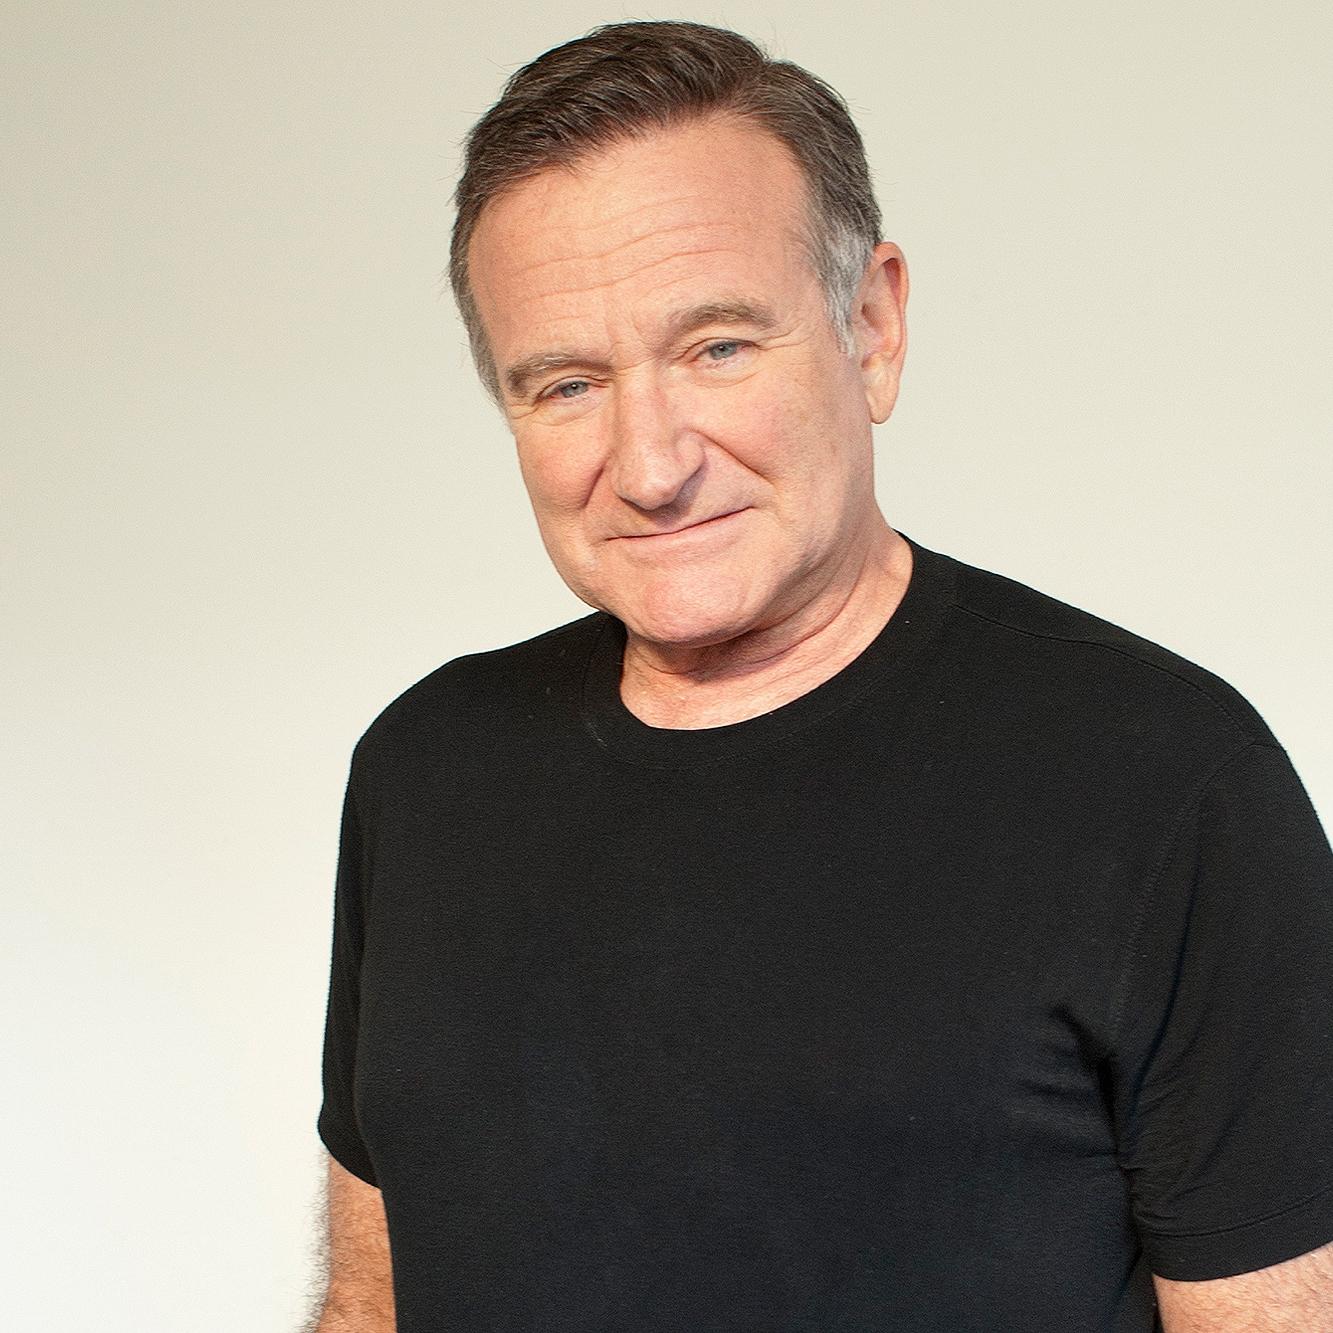 Robin Williams Portraits